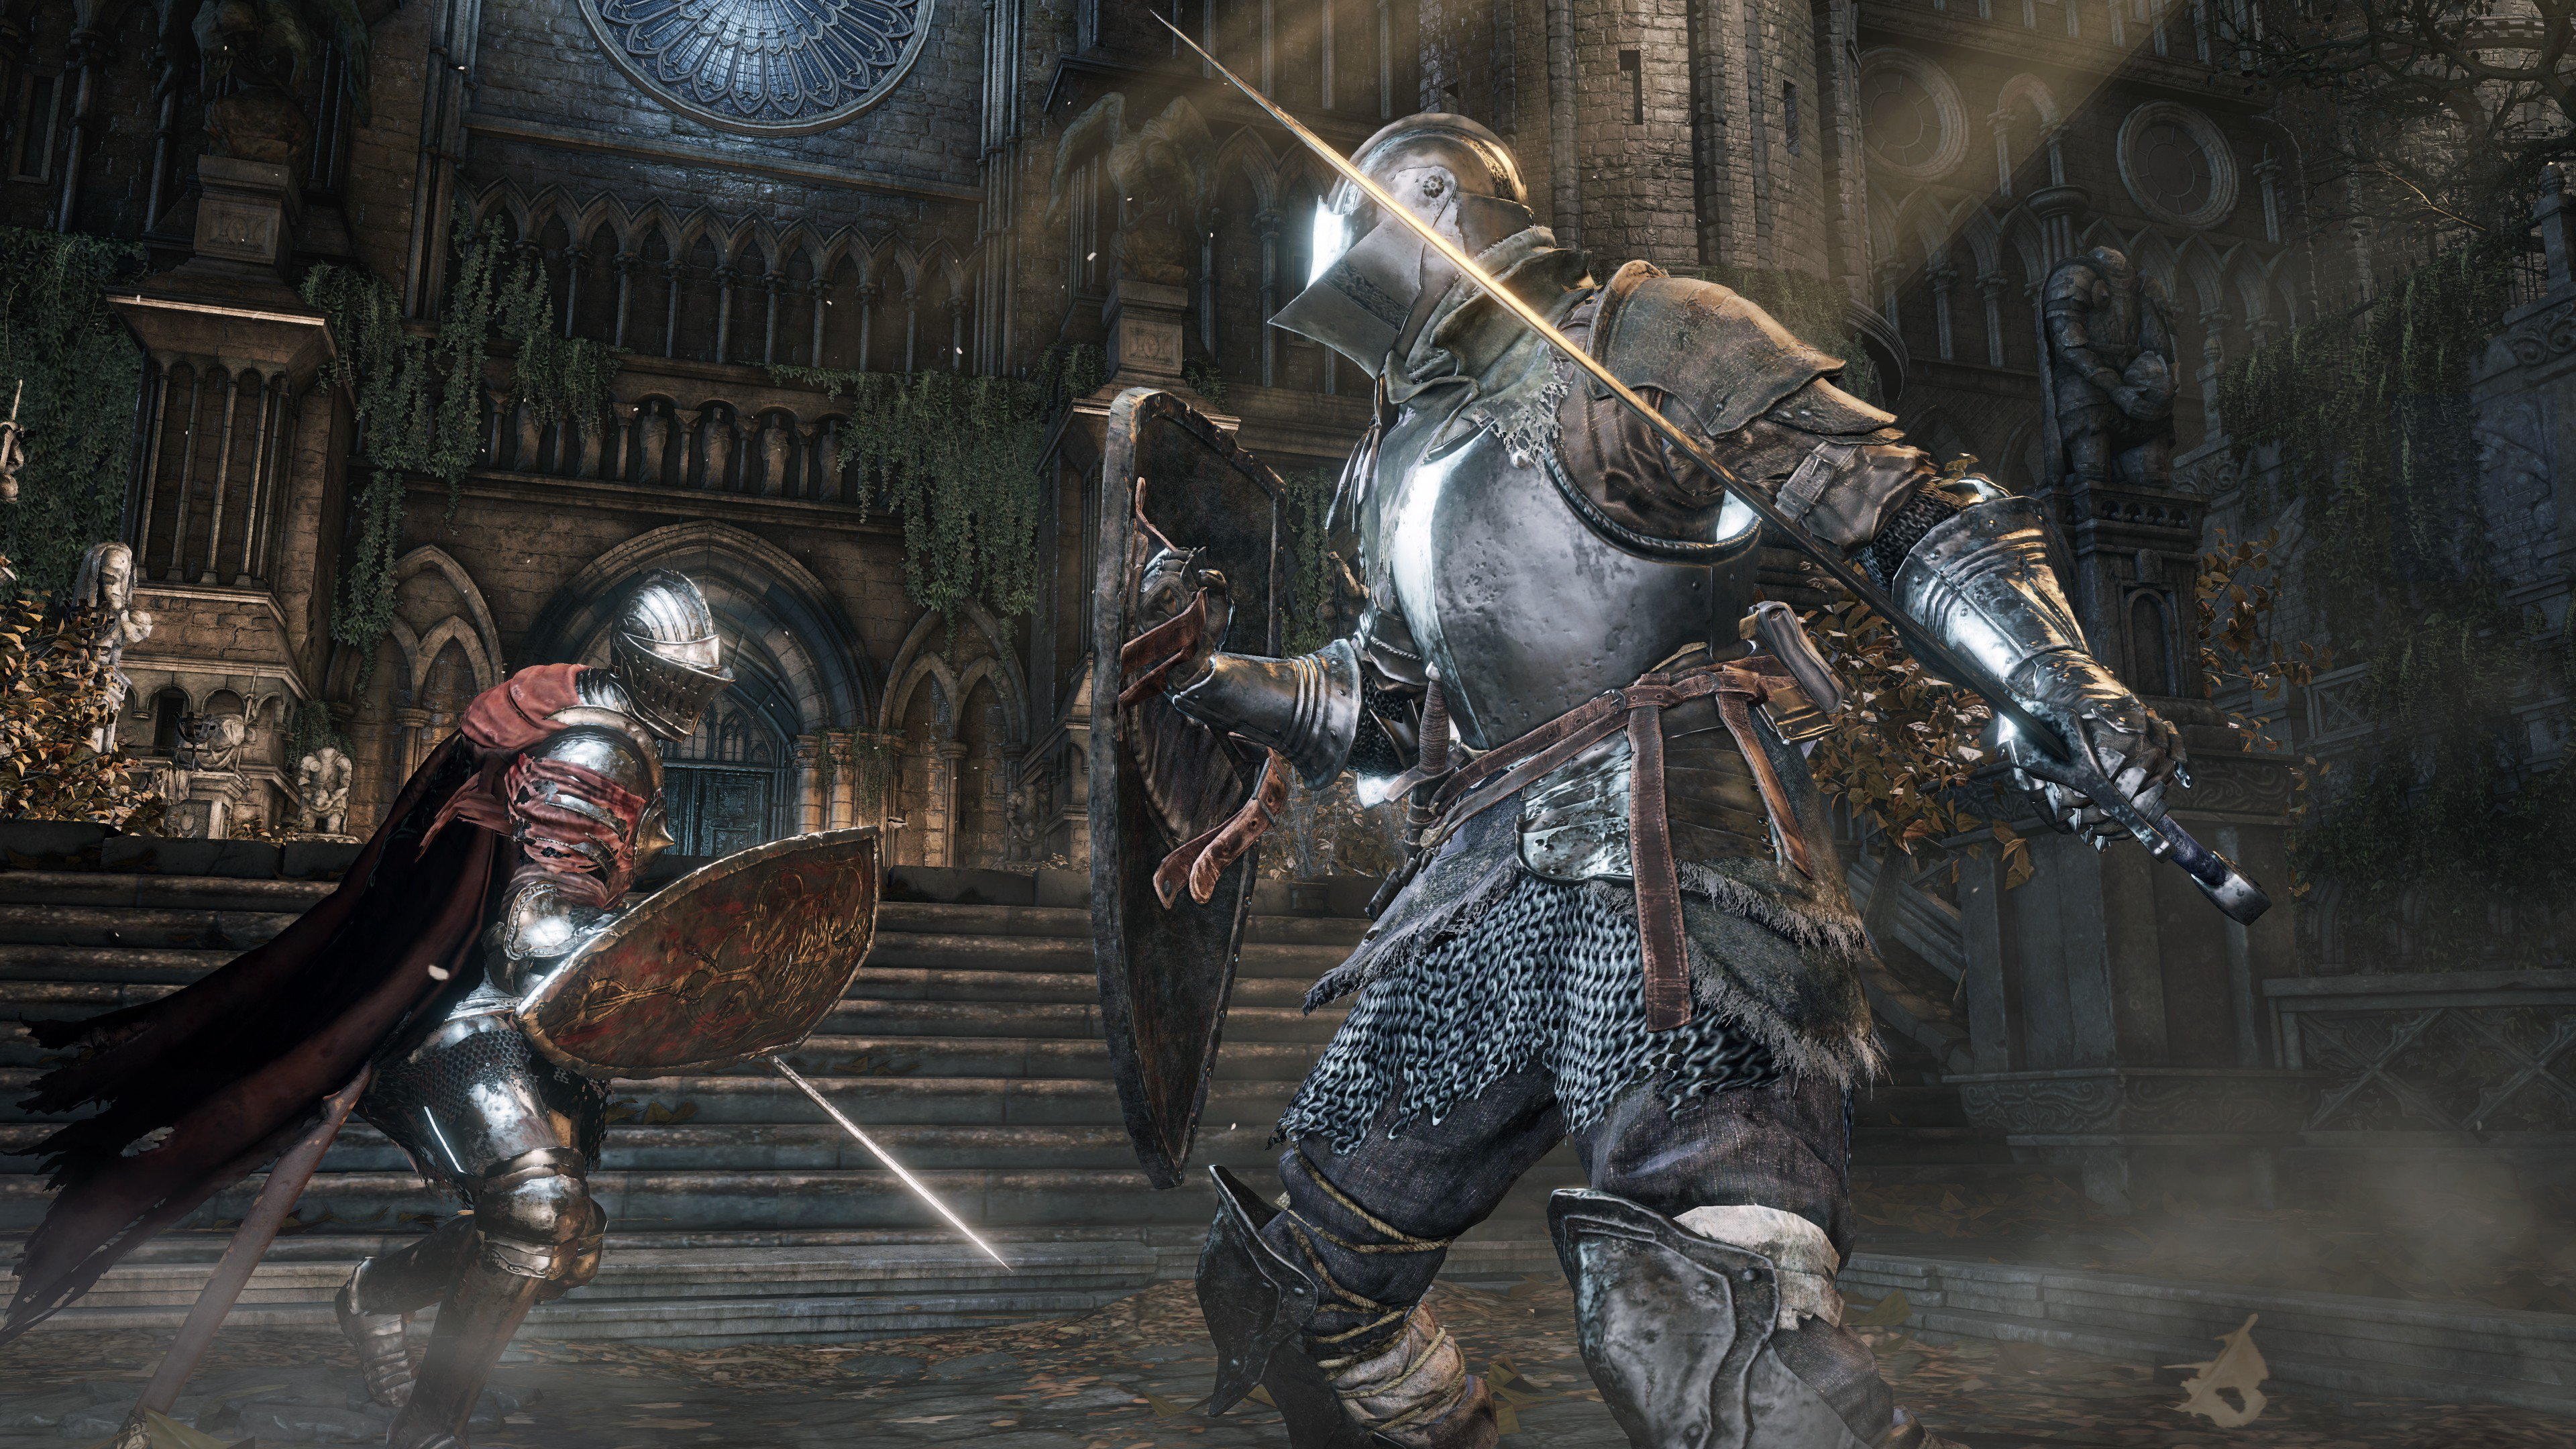 Dark Souls 3, HD Games, 4k Wallpapers, Images, Backgrounds ...